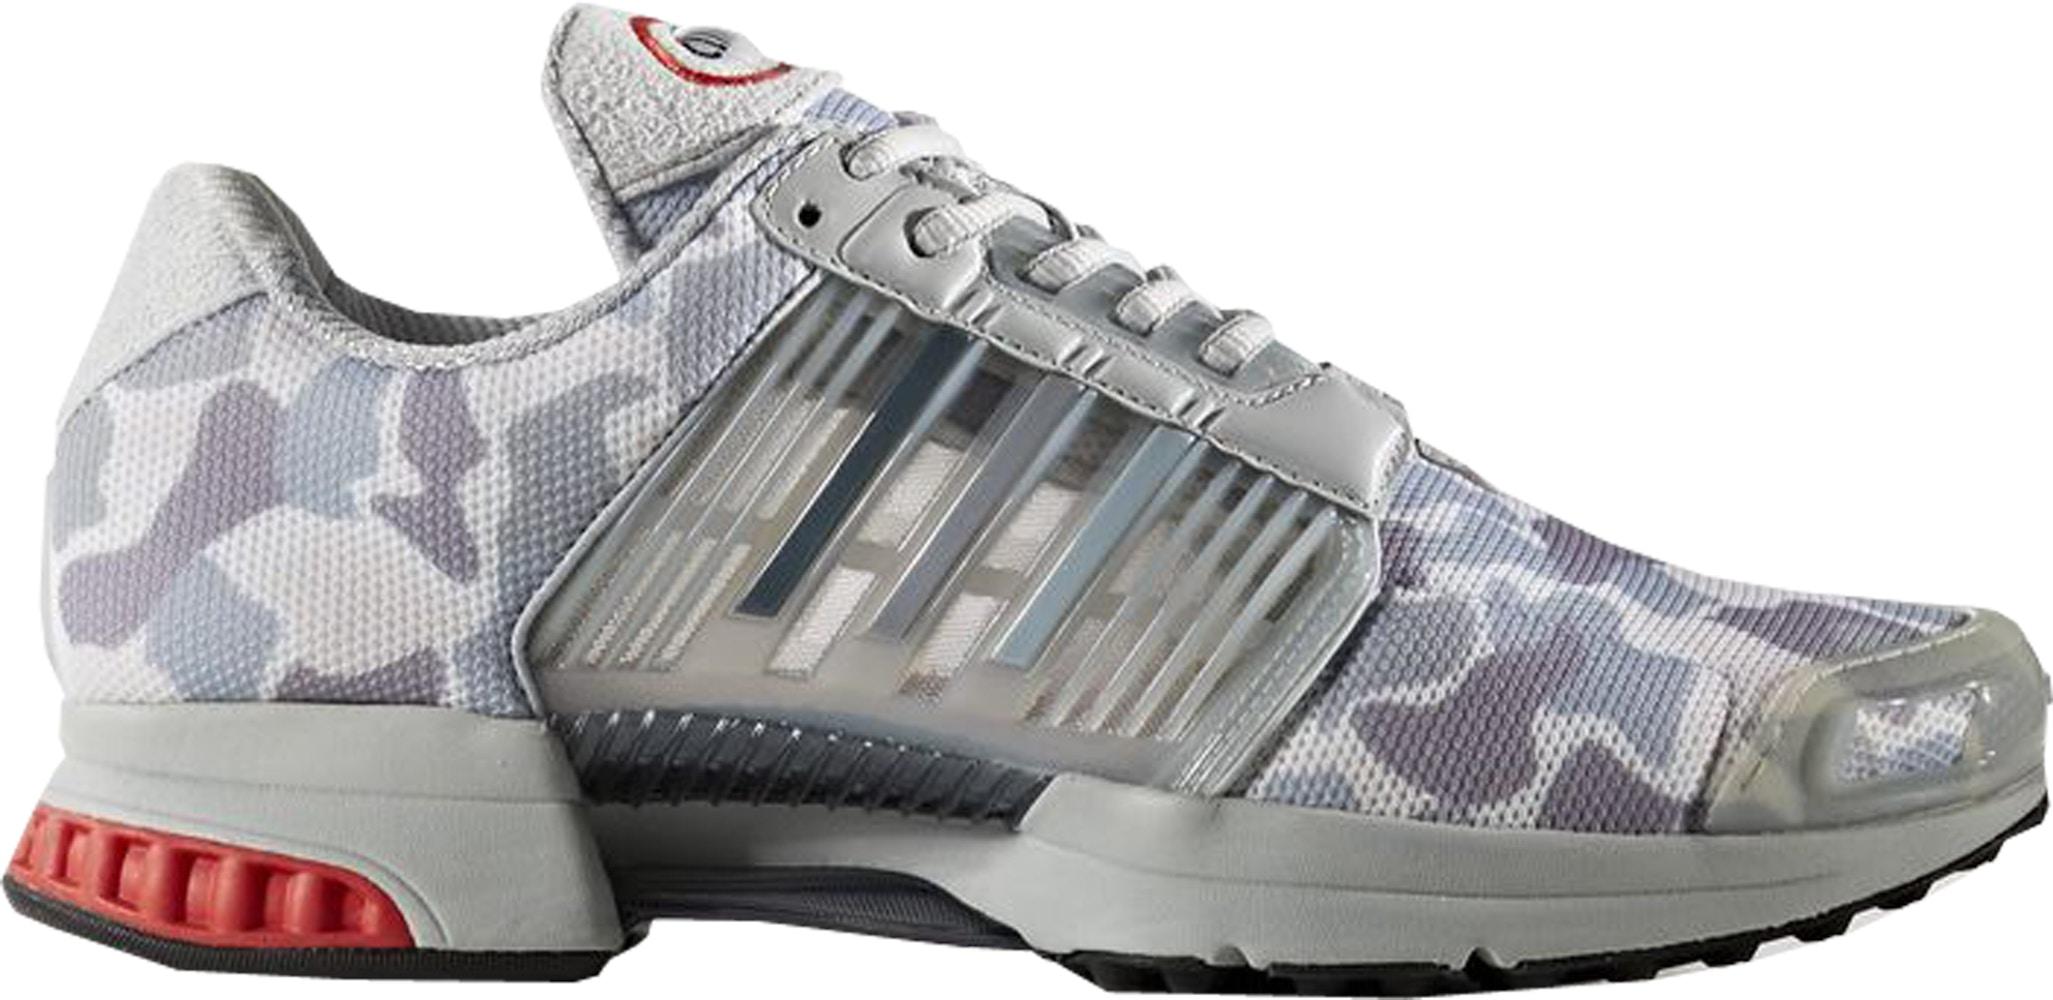 adidas Climacool 1 Camo Grey - BA7178